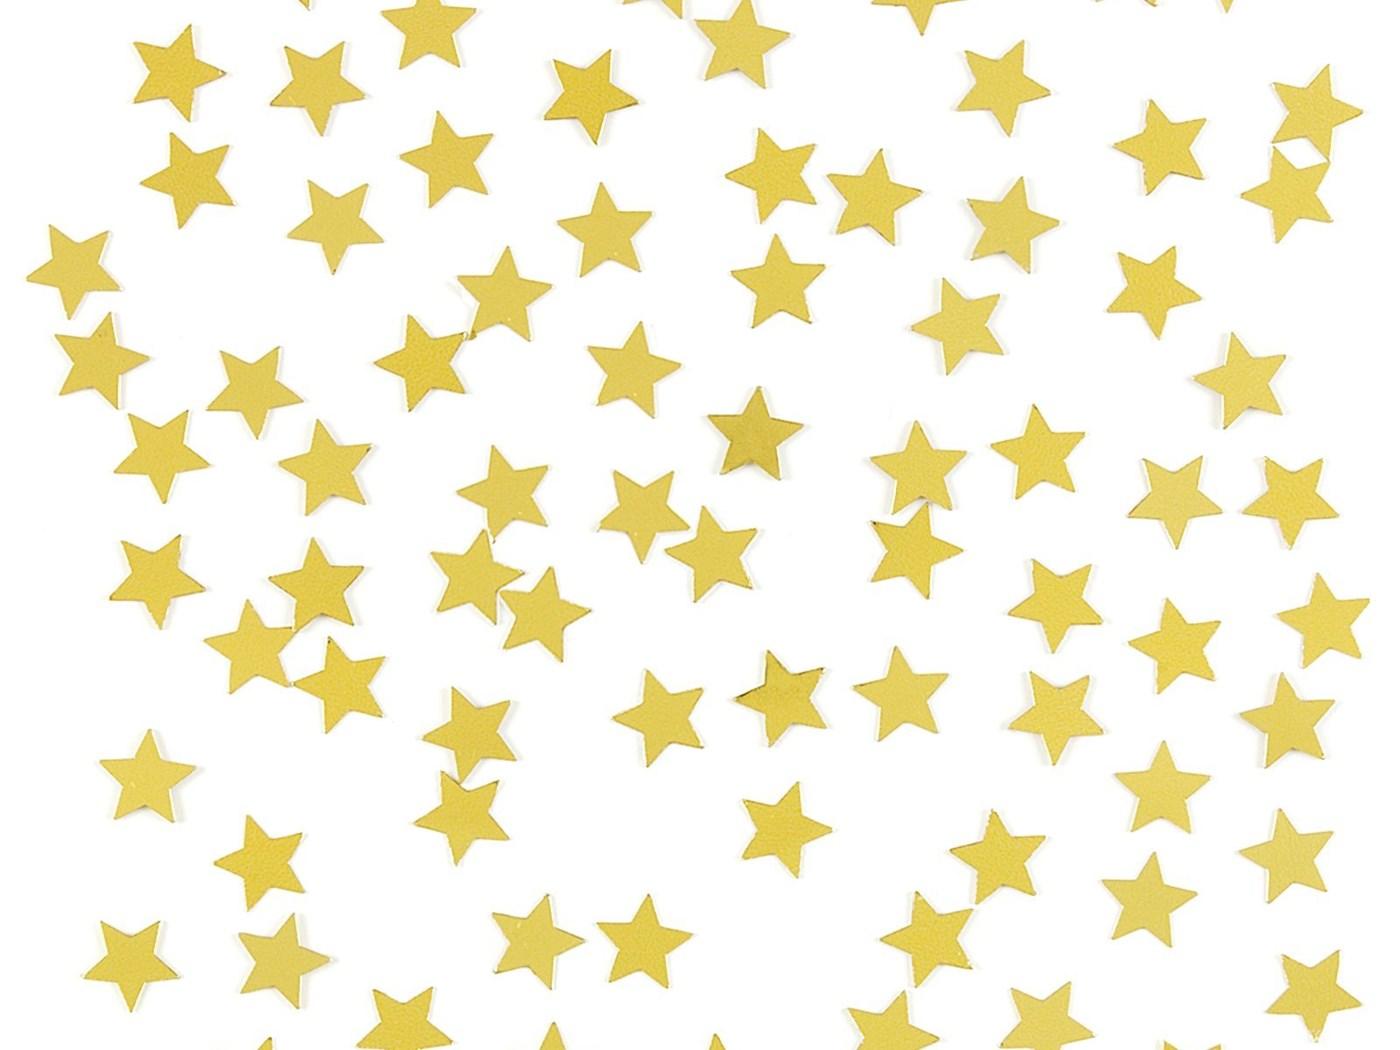 1400x1050 Public Domain Stars Long Gold Star Linebars Stars Clip Art Image